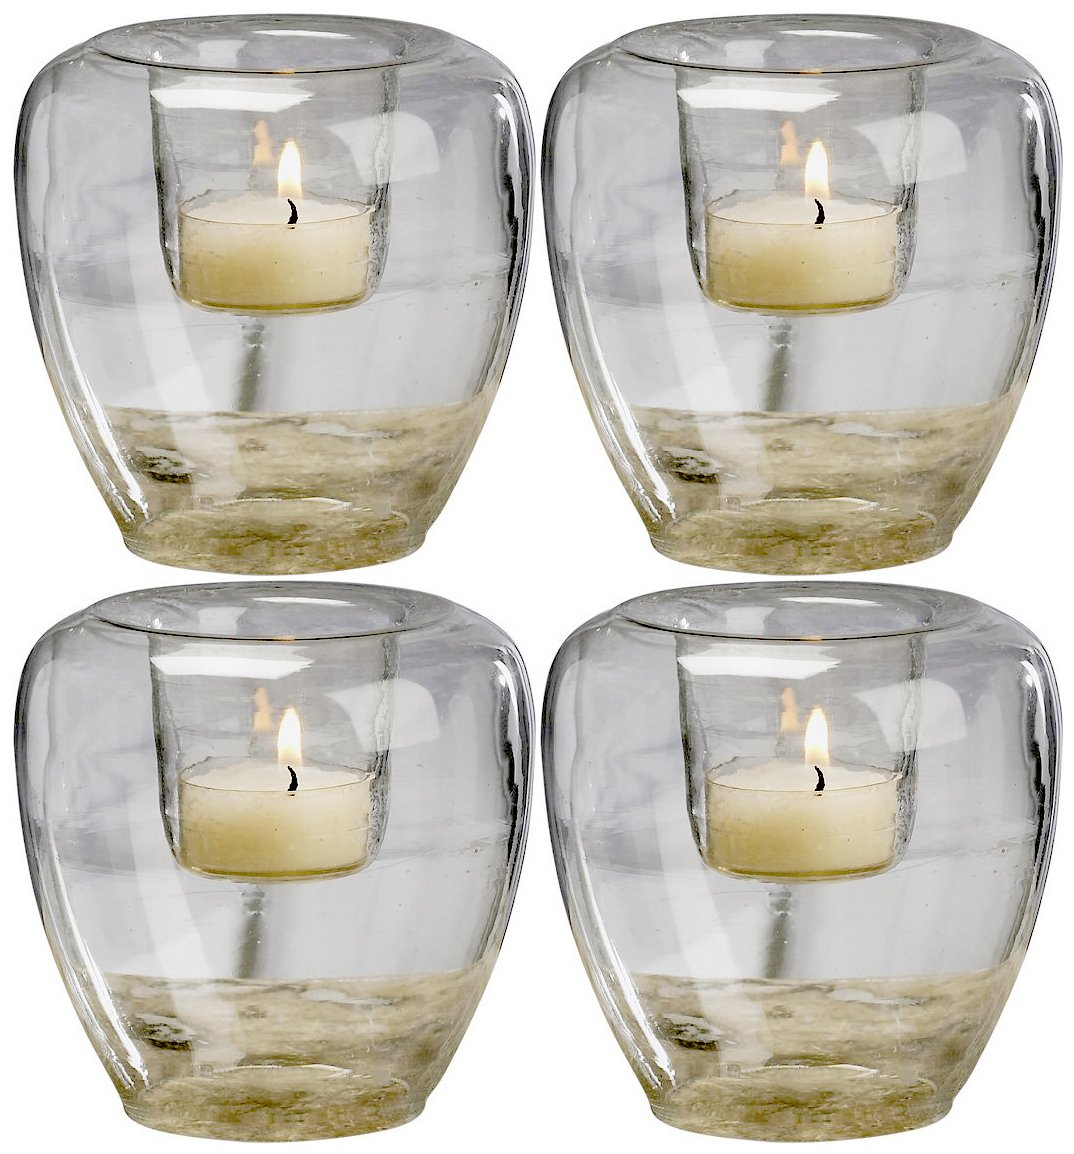 Set of 4 Biedermann Home Decor HJ643C Biedermann Add Your Own Theme Bubble Glass Votive Candle Holders